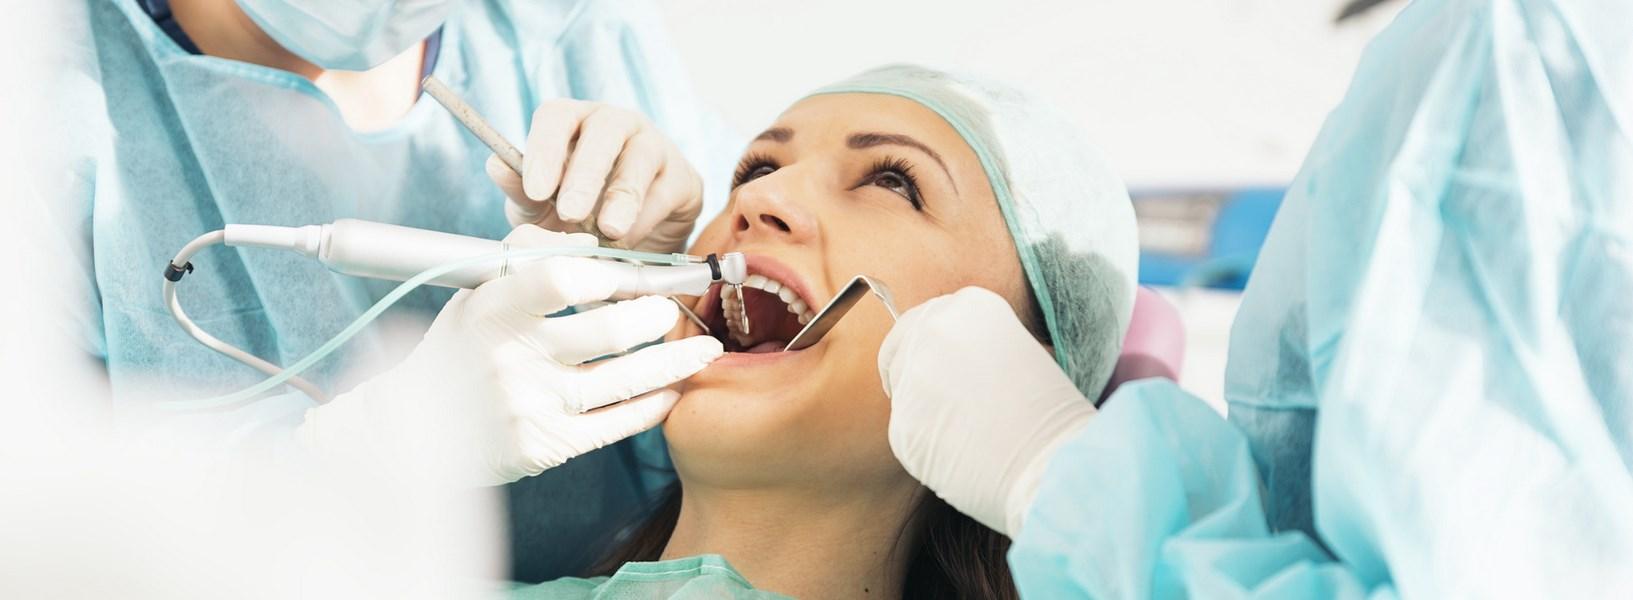 bezbolesna chirurgia stomatologiczna w Legnicy